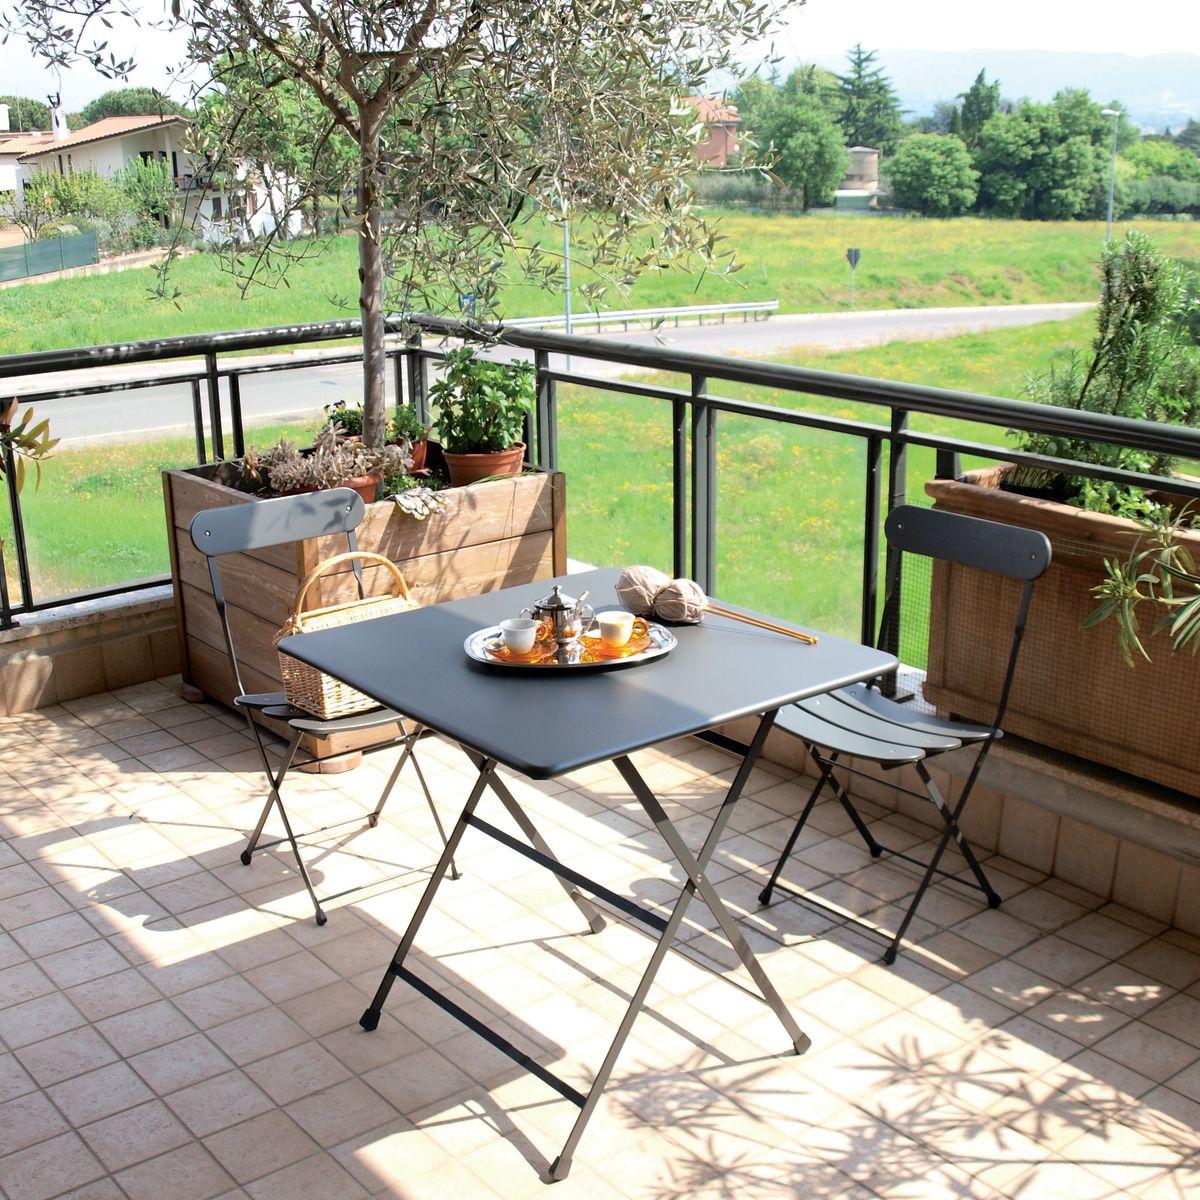 Leroy merlin tavoli giardino for Panche in legno leroy merlin